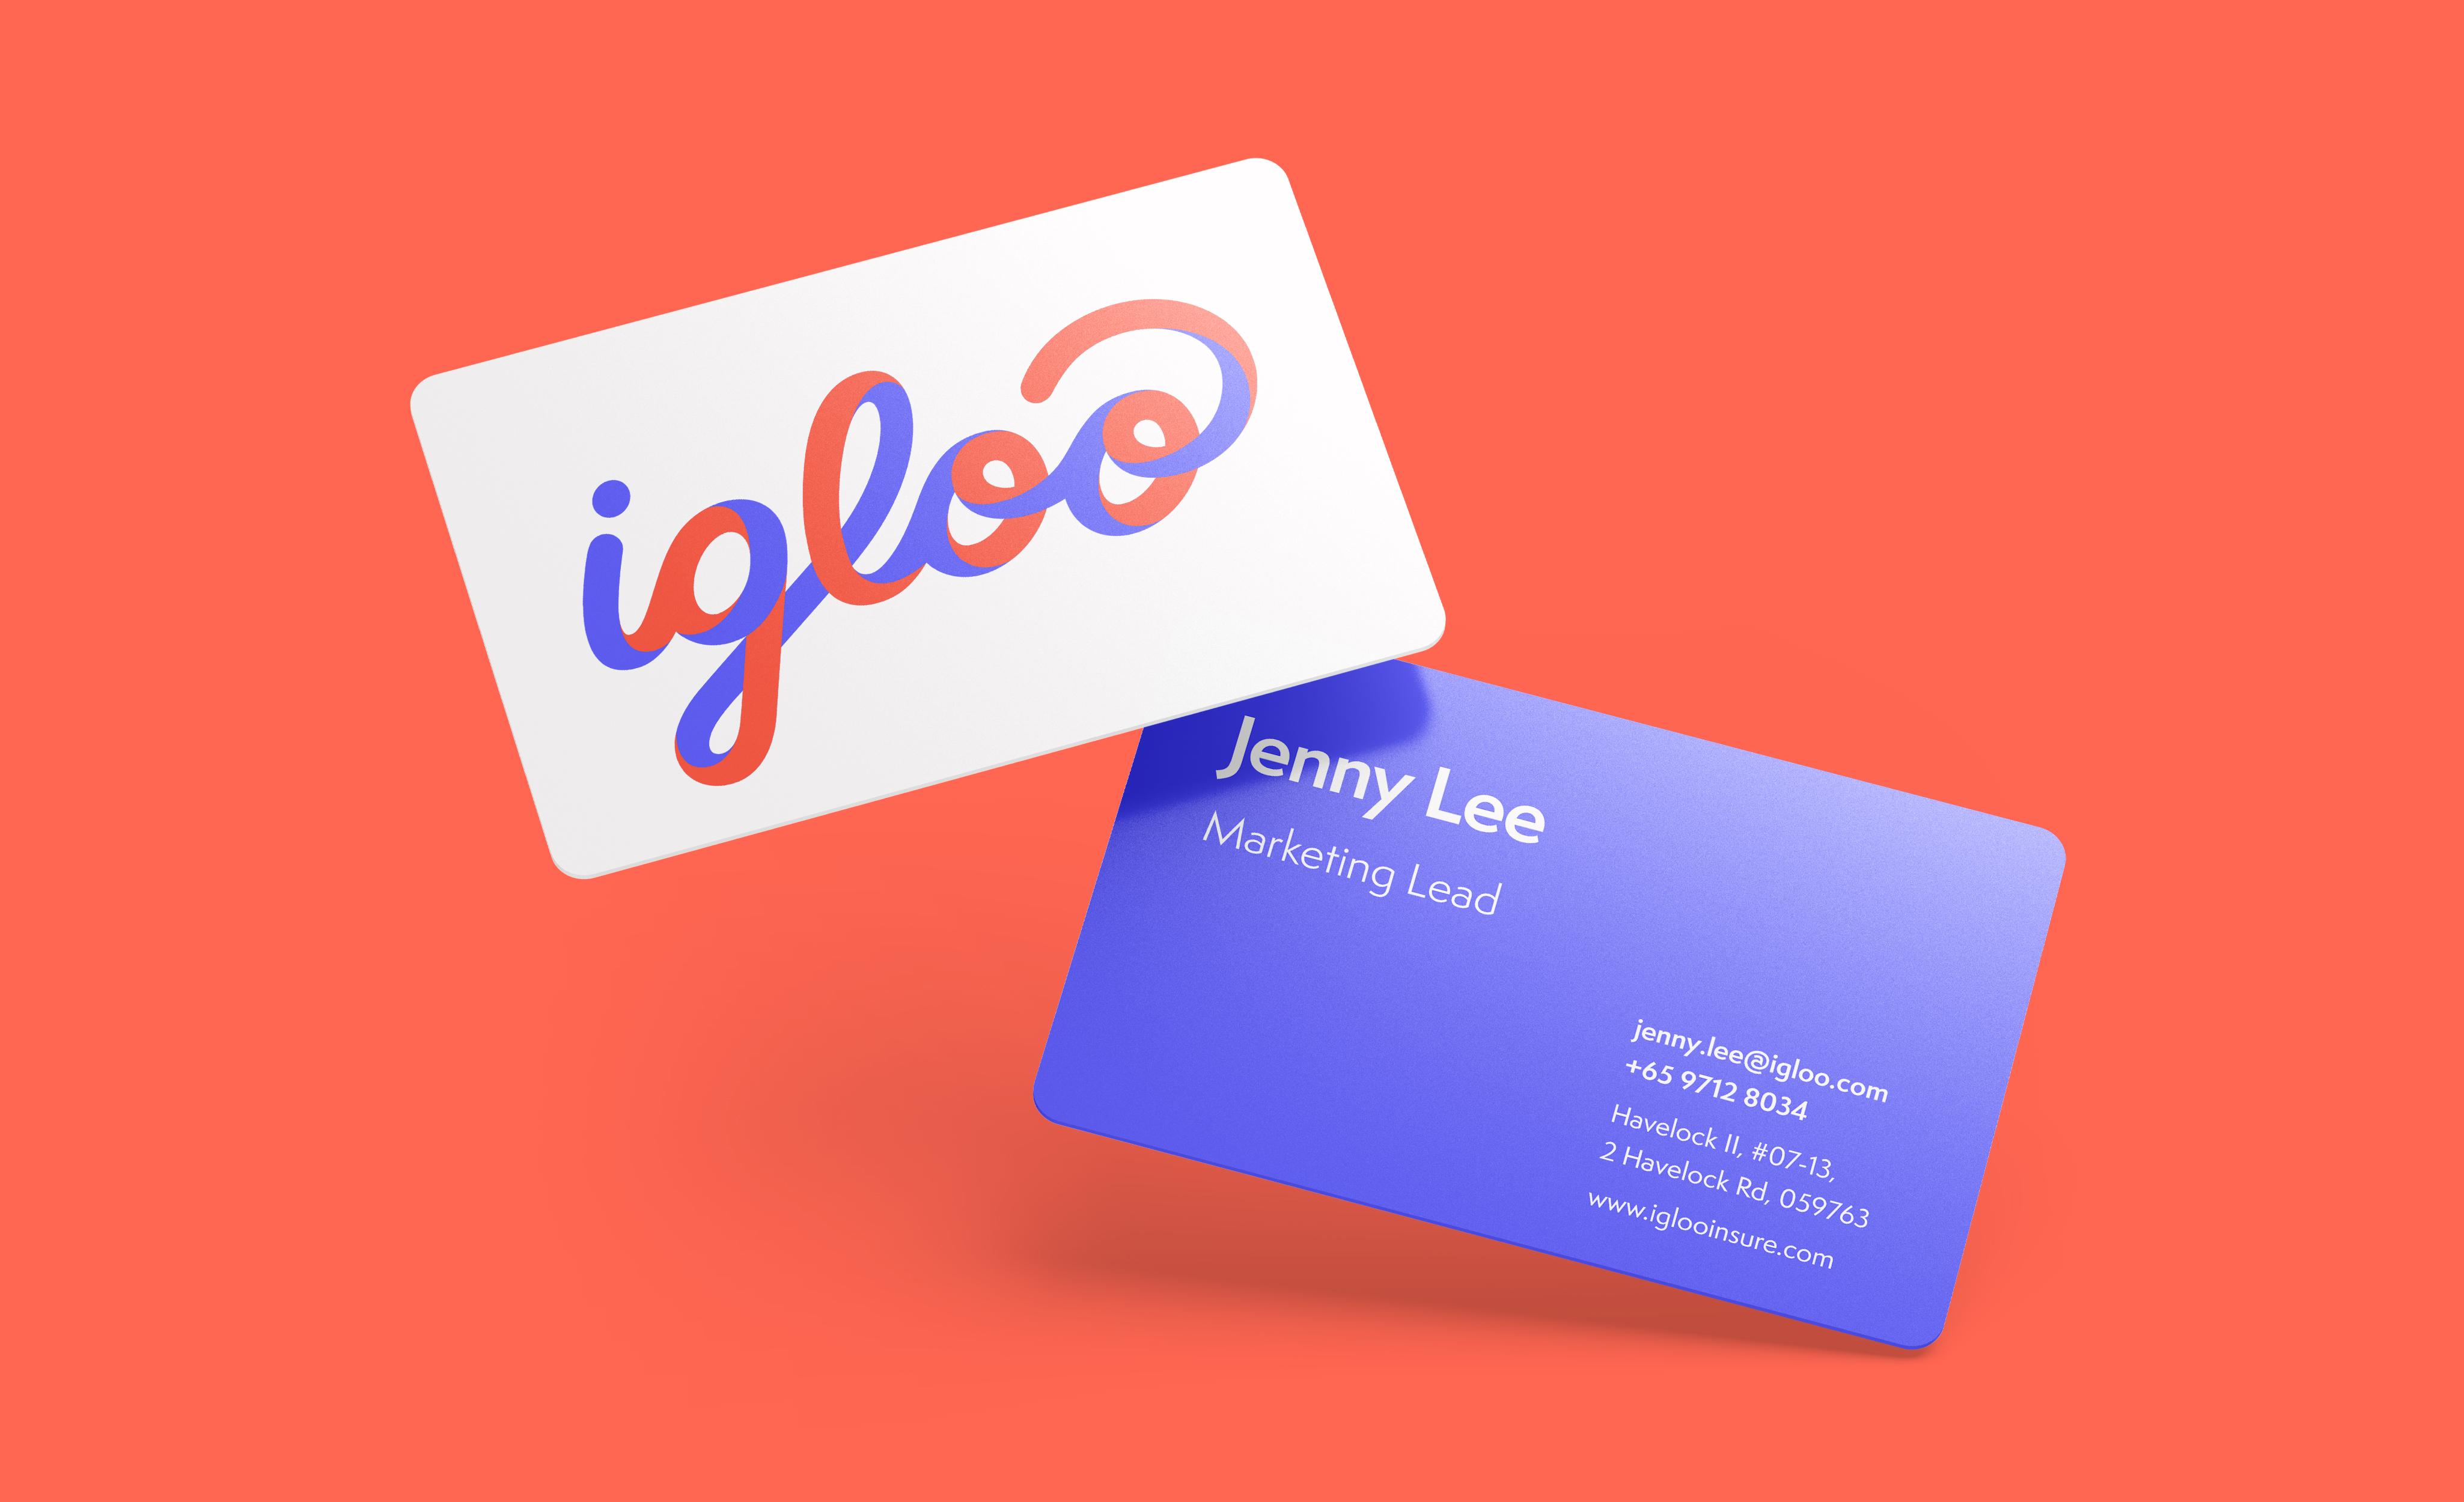 Igloo Insurance